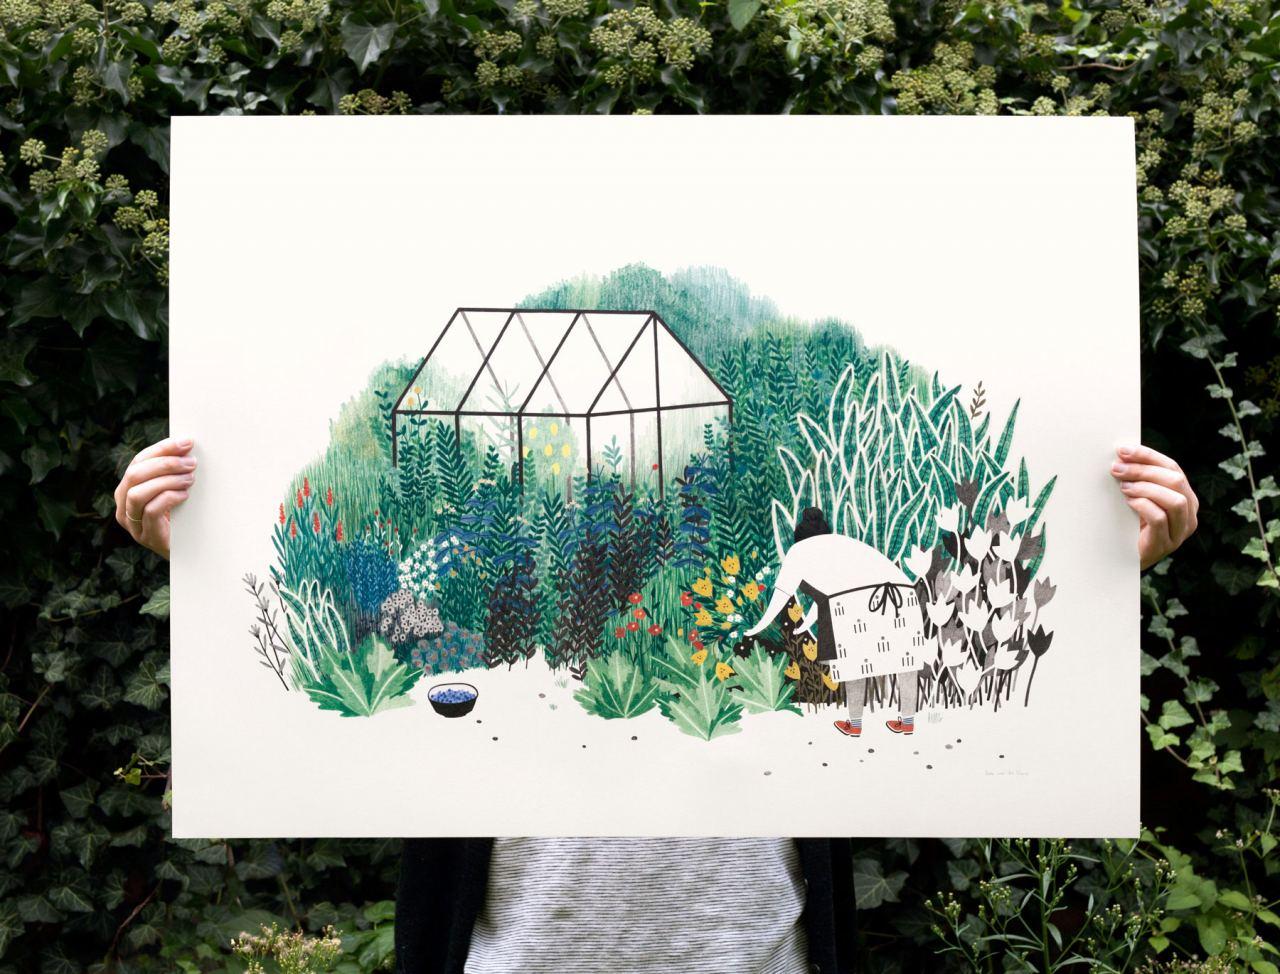 Bloemenstruik Print (60x80cm)